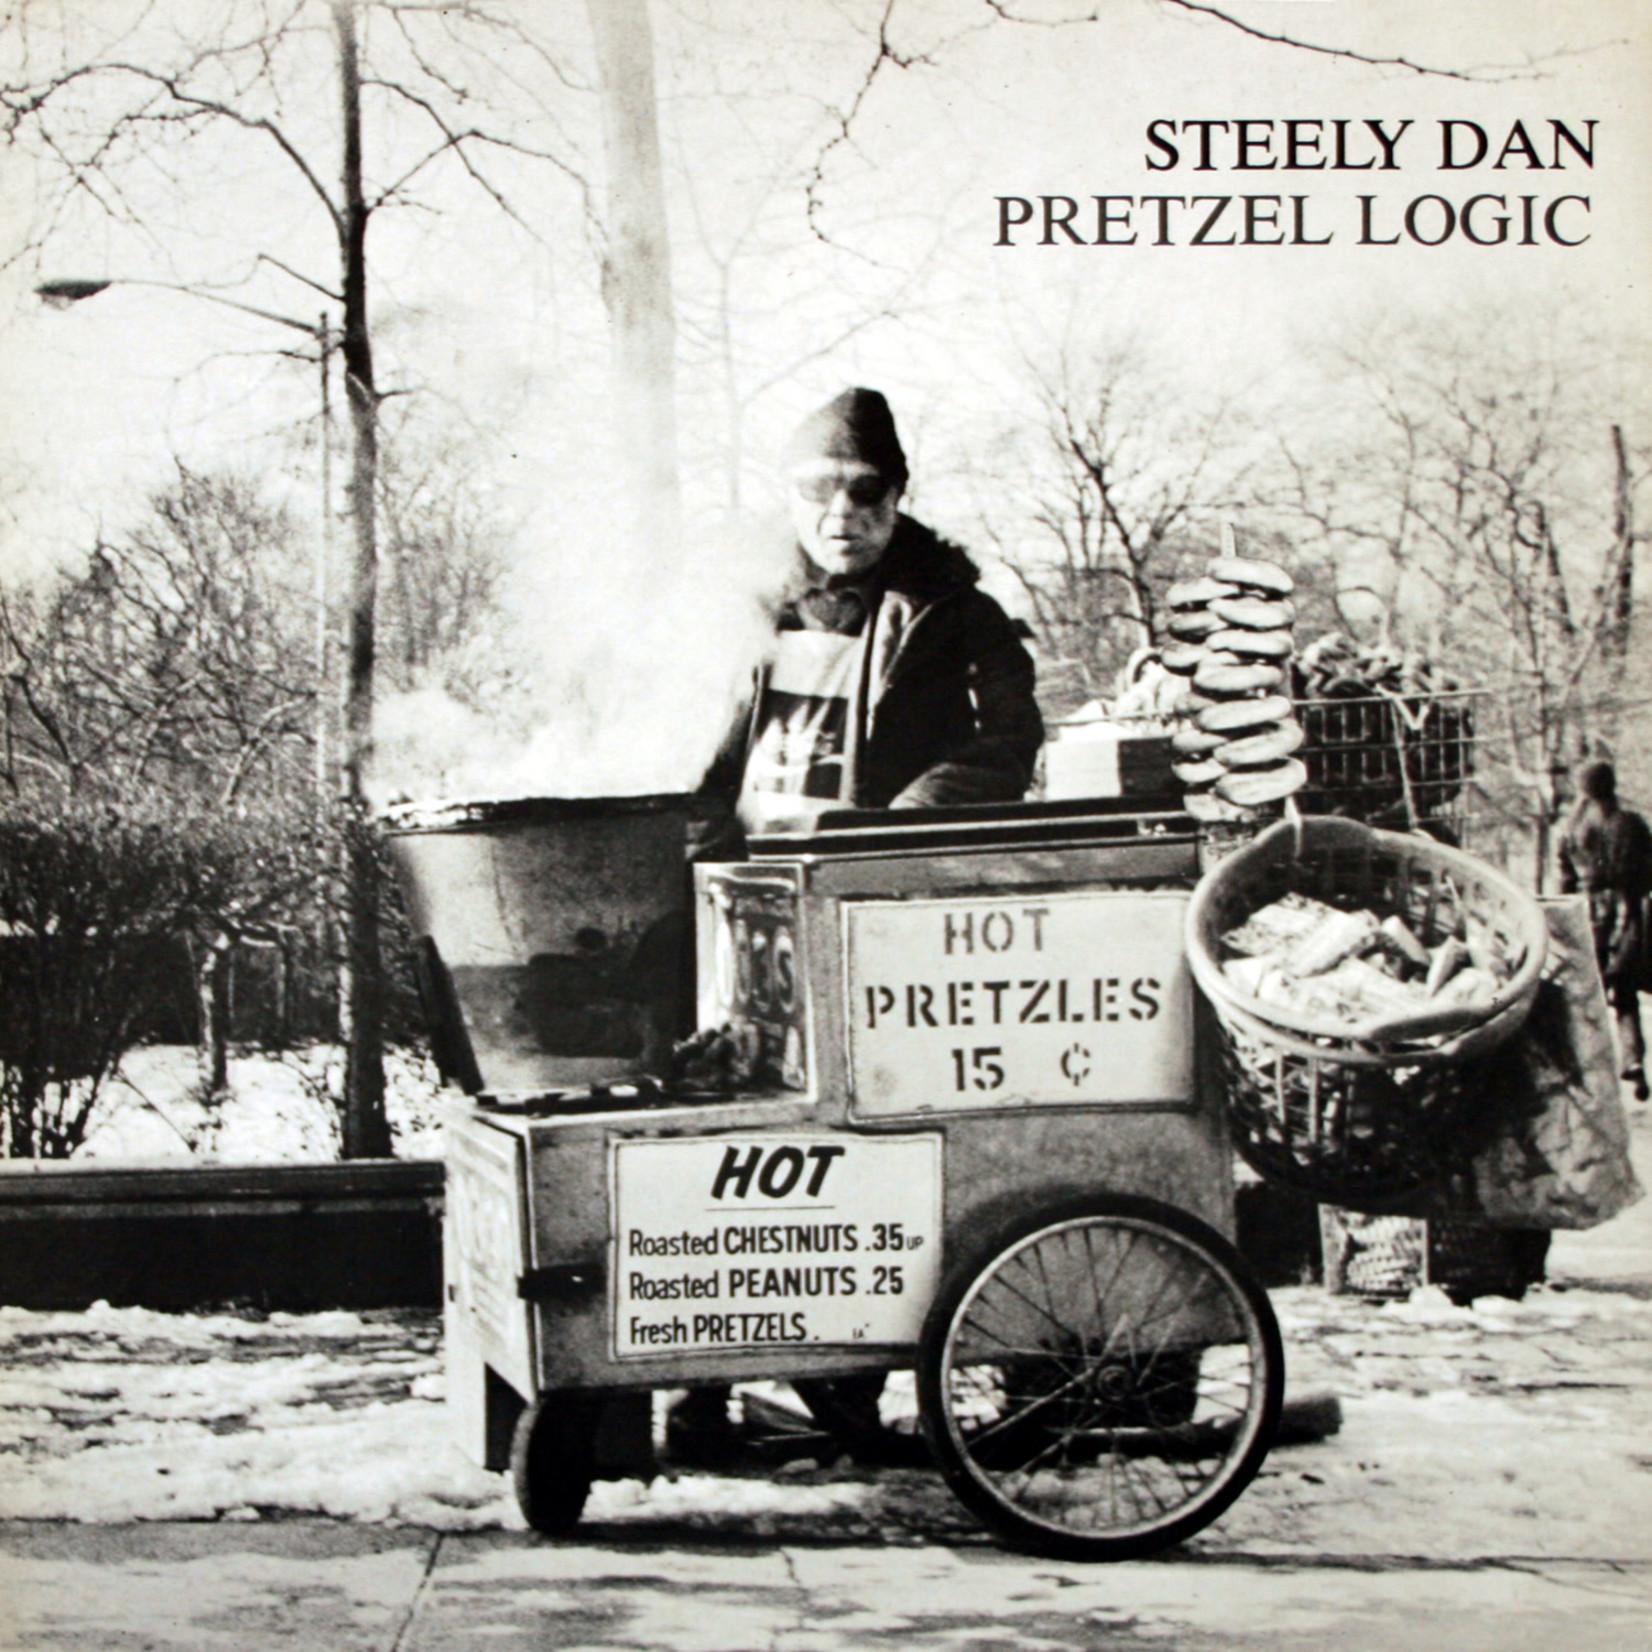 [Vintage] Steely Dan: Pretzel Logic